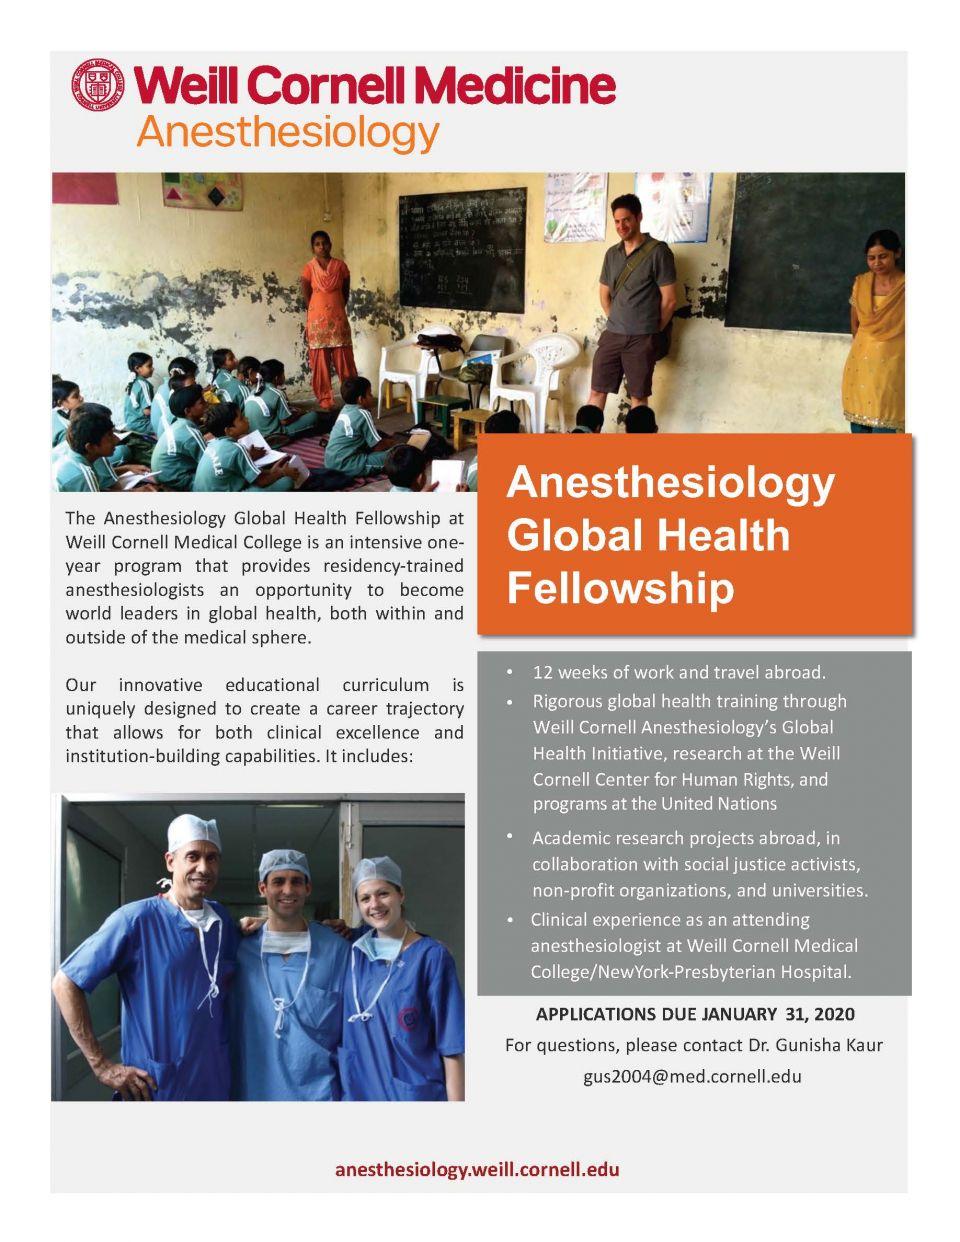 Global Health Fellowship Flyer